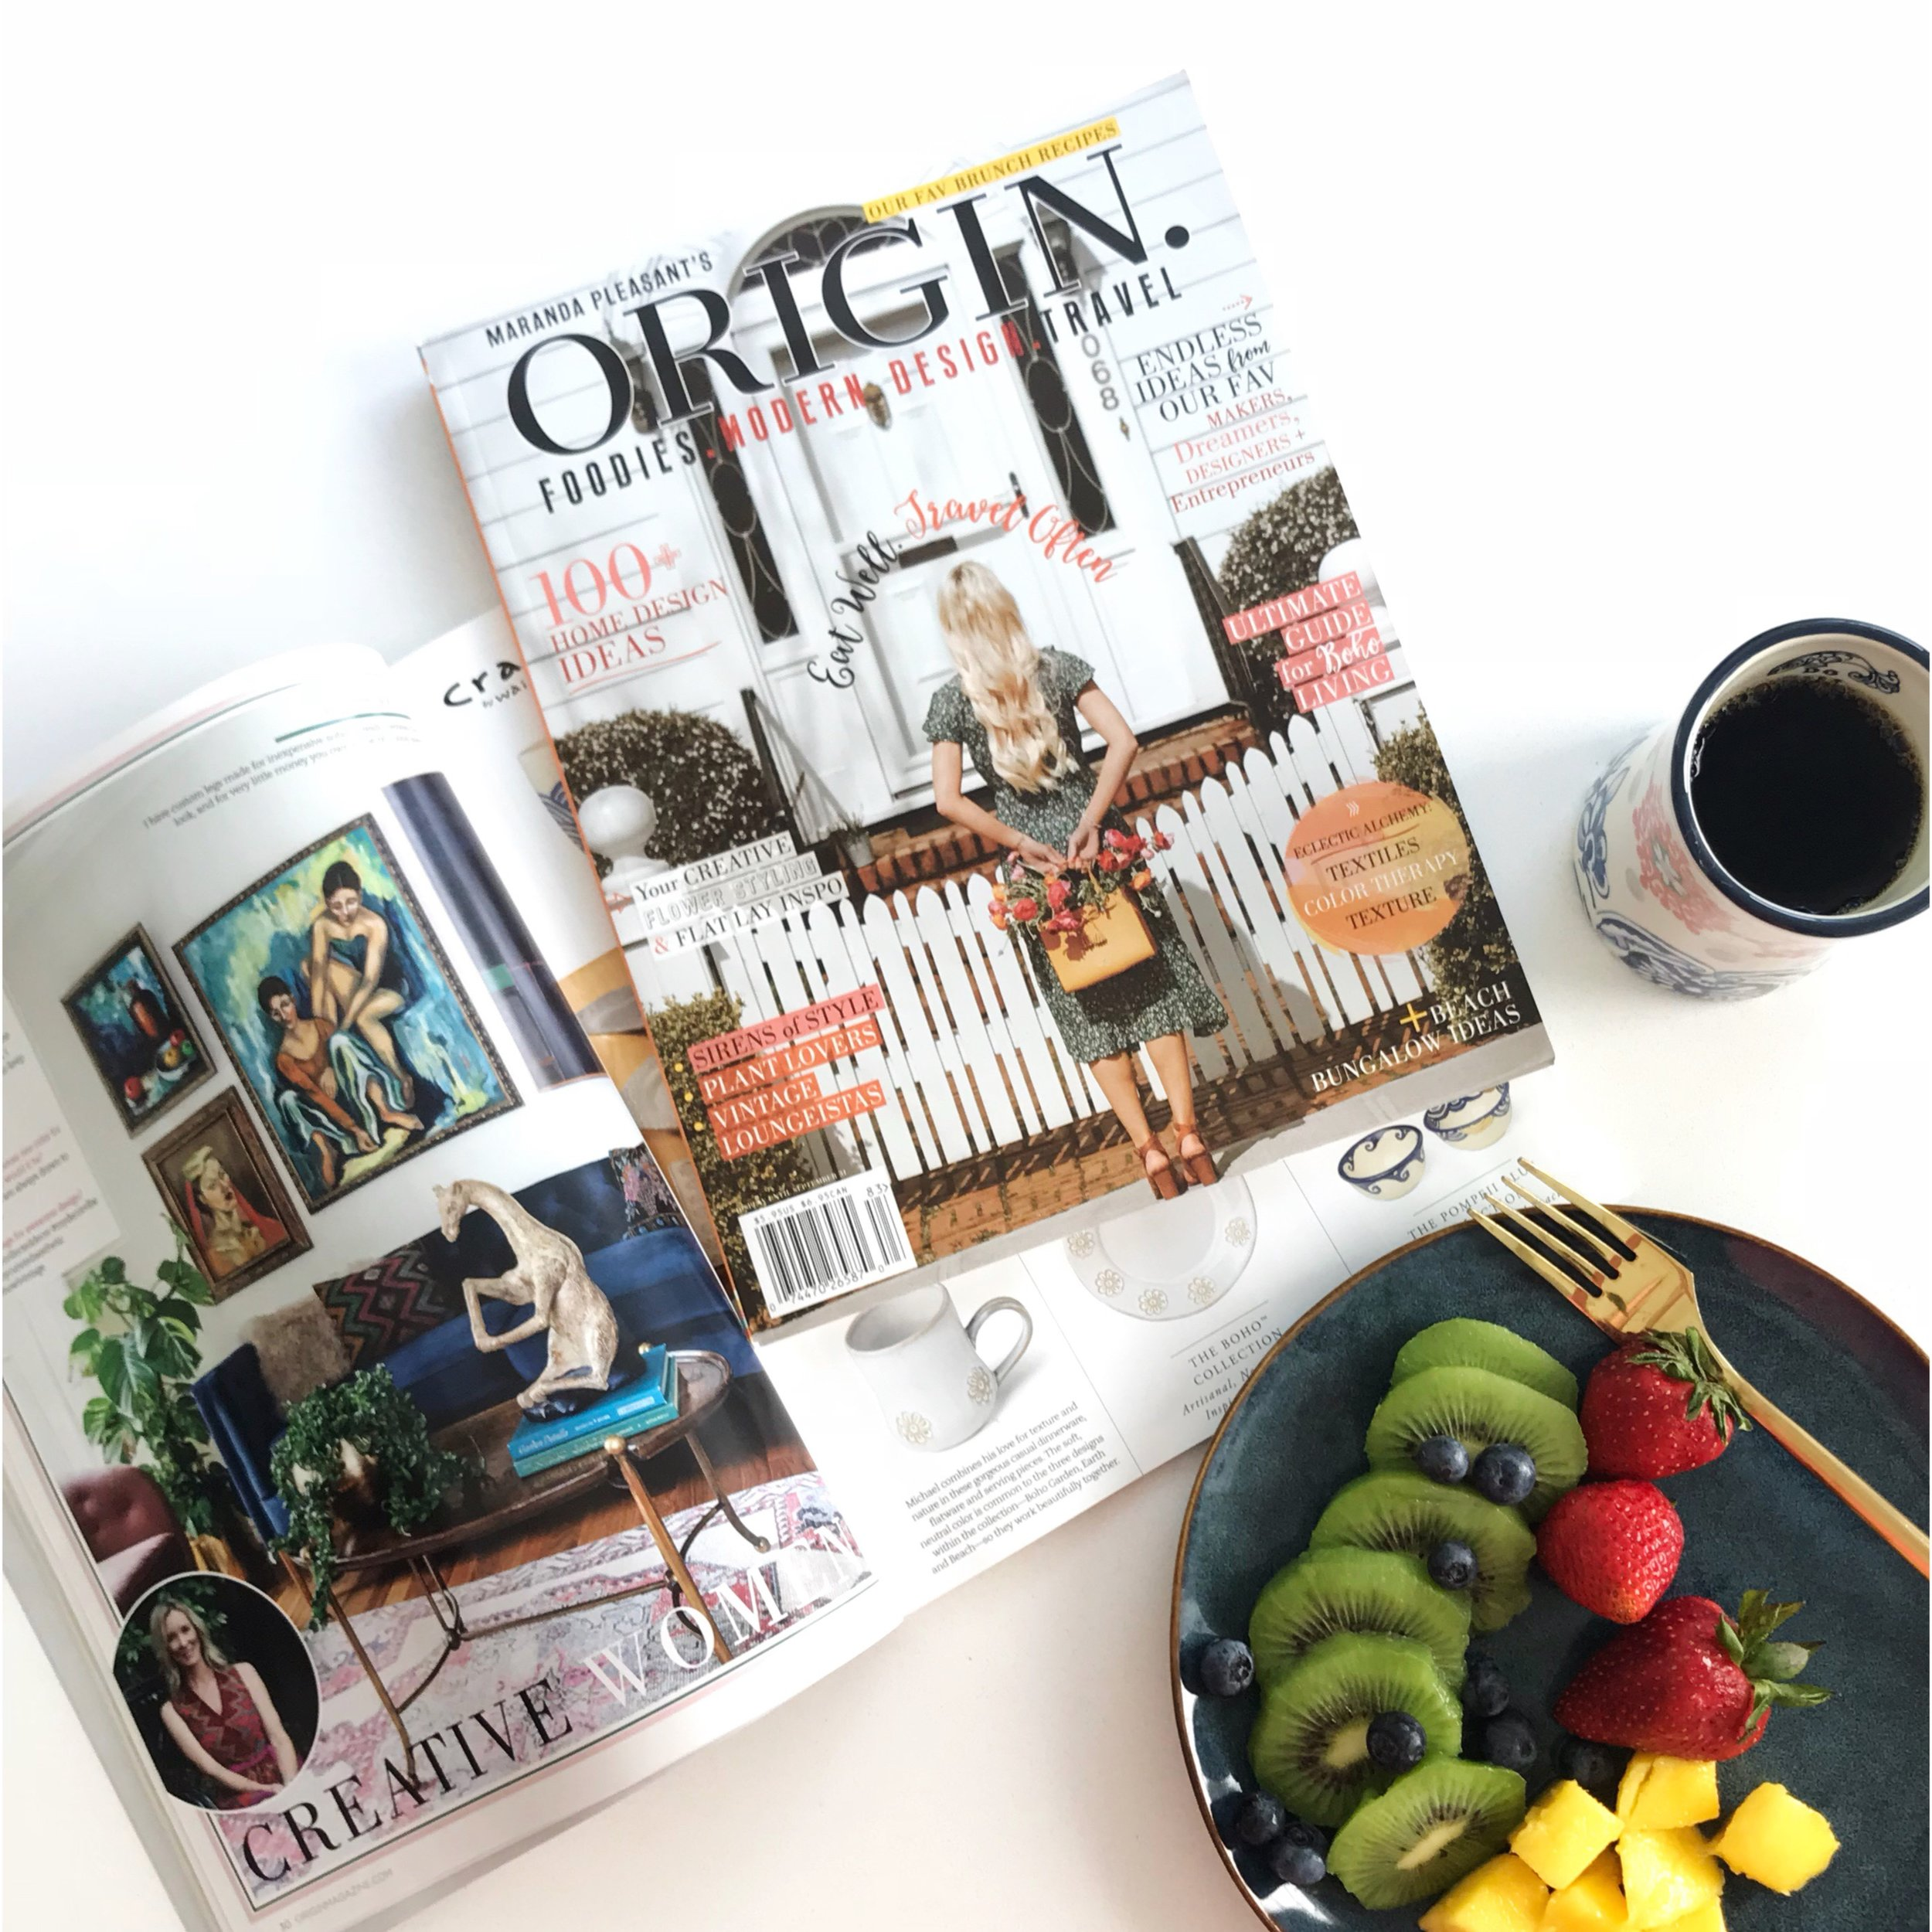 kristin laing origin magazine feature.JPG